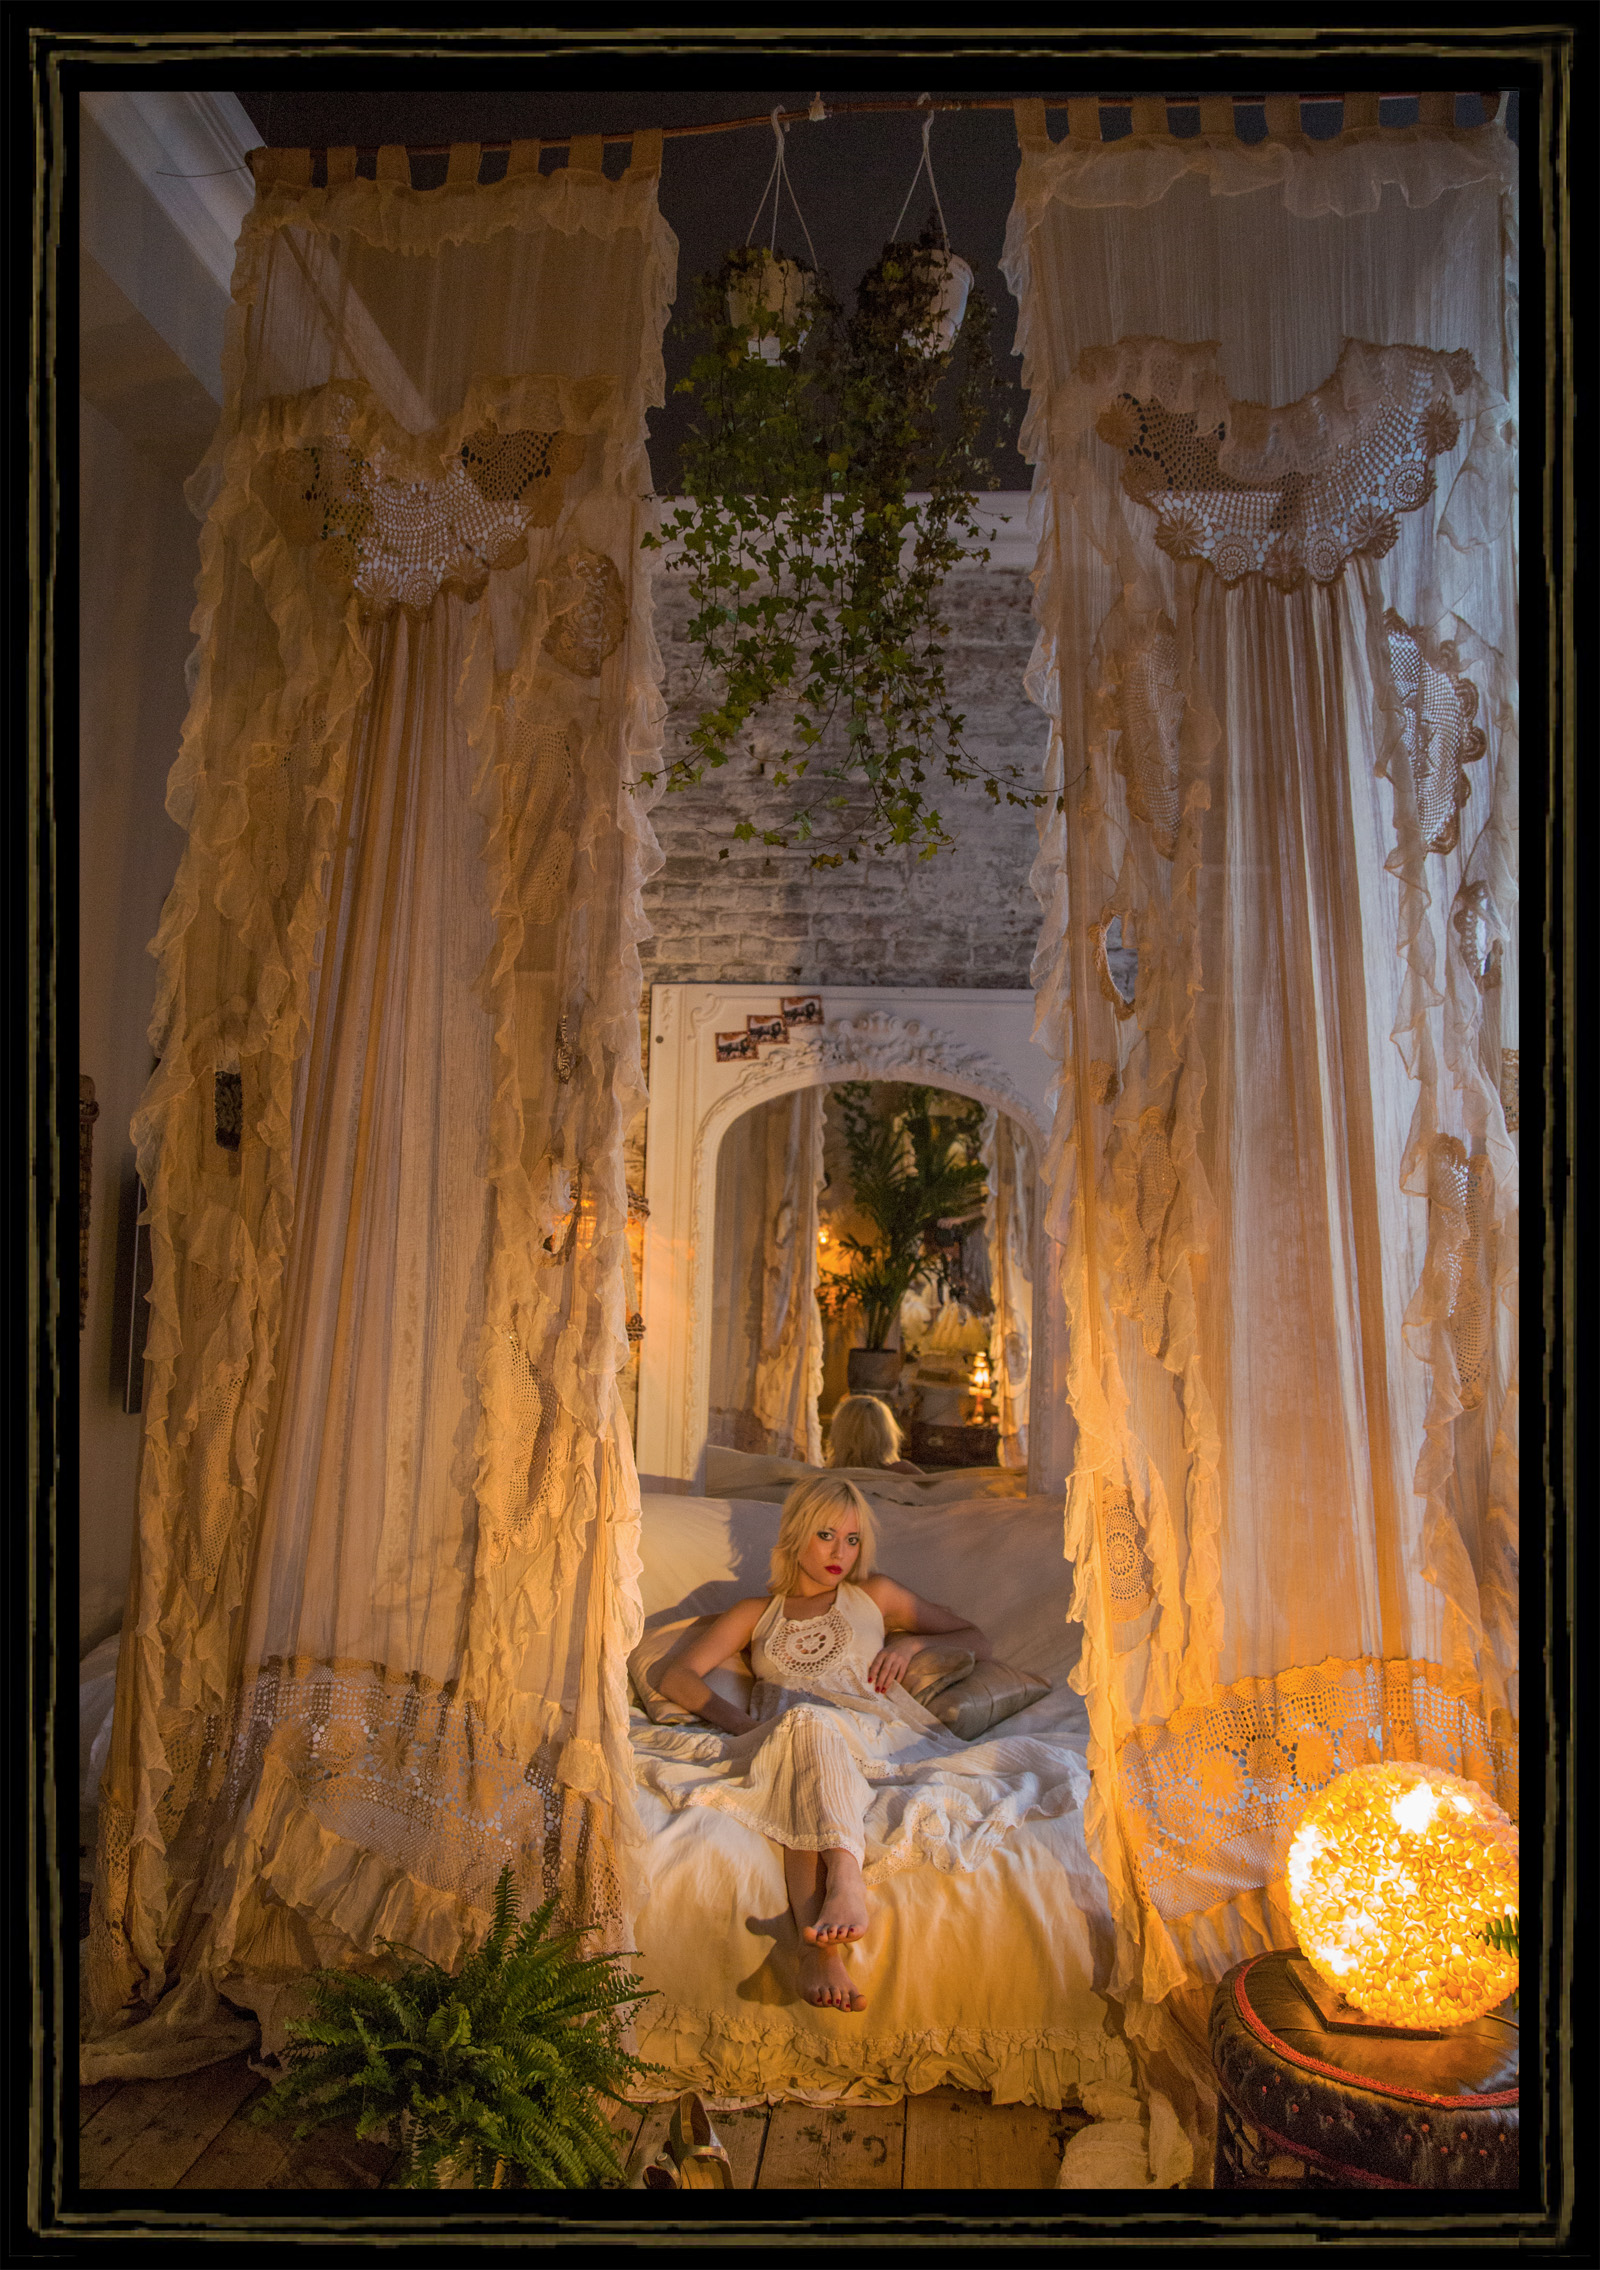 Curtain-39.jpg